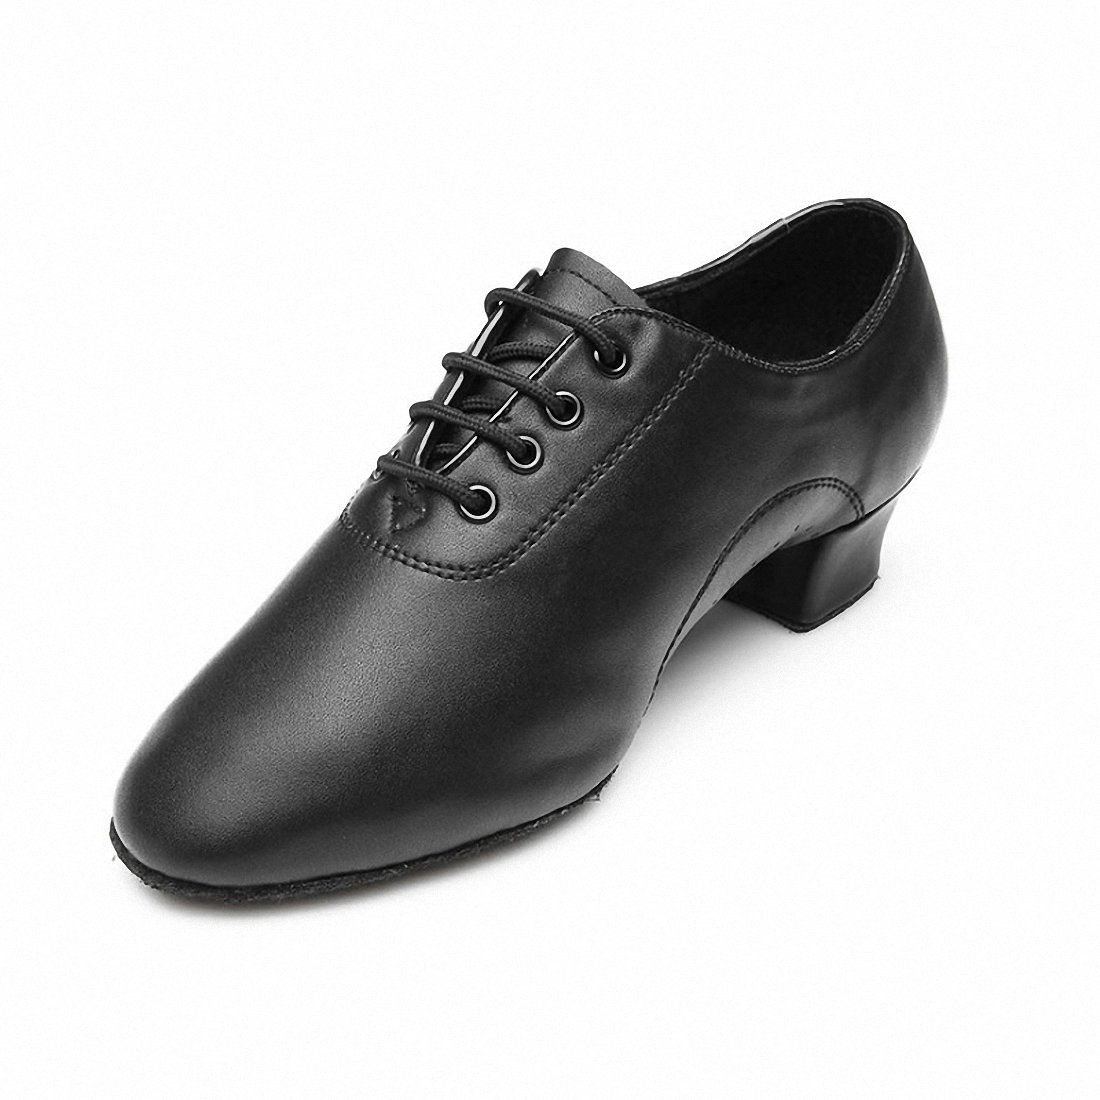 MQFORU Chaussure de Danse Homme Garçon pour Danse Moderne Latine Jazz Salsa Tango Salle de Bal en Cuir Semelle Souple Noir SANSHA 701-44